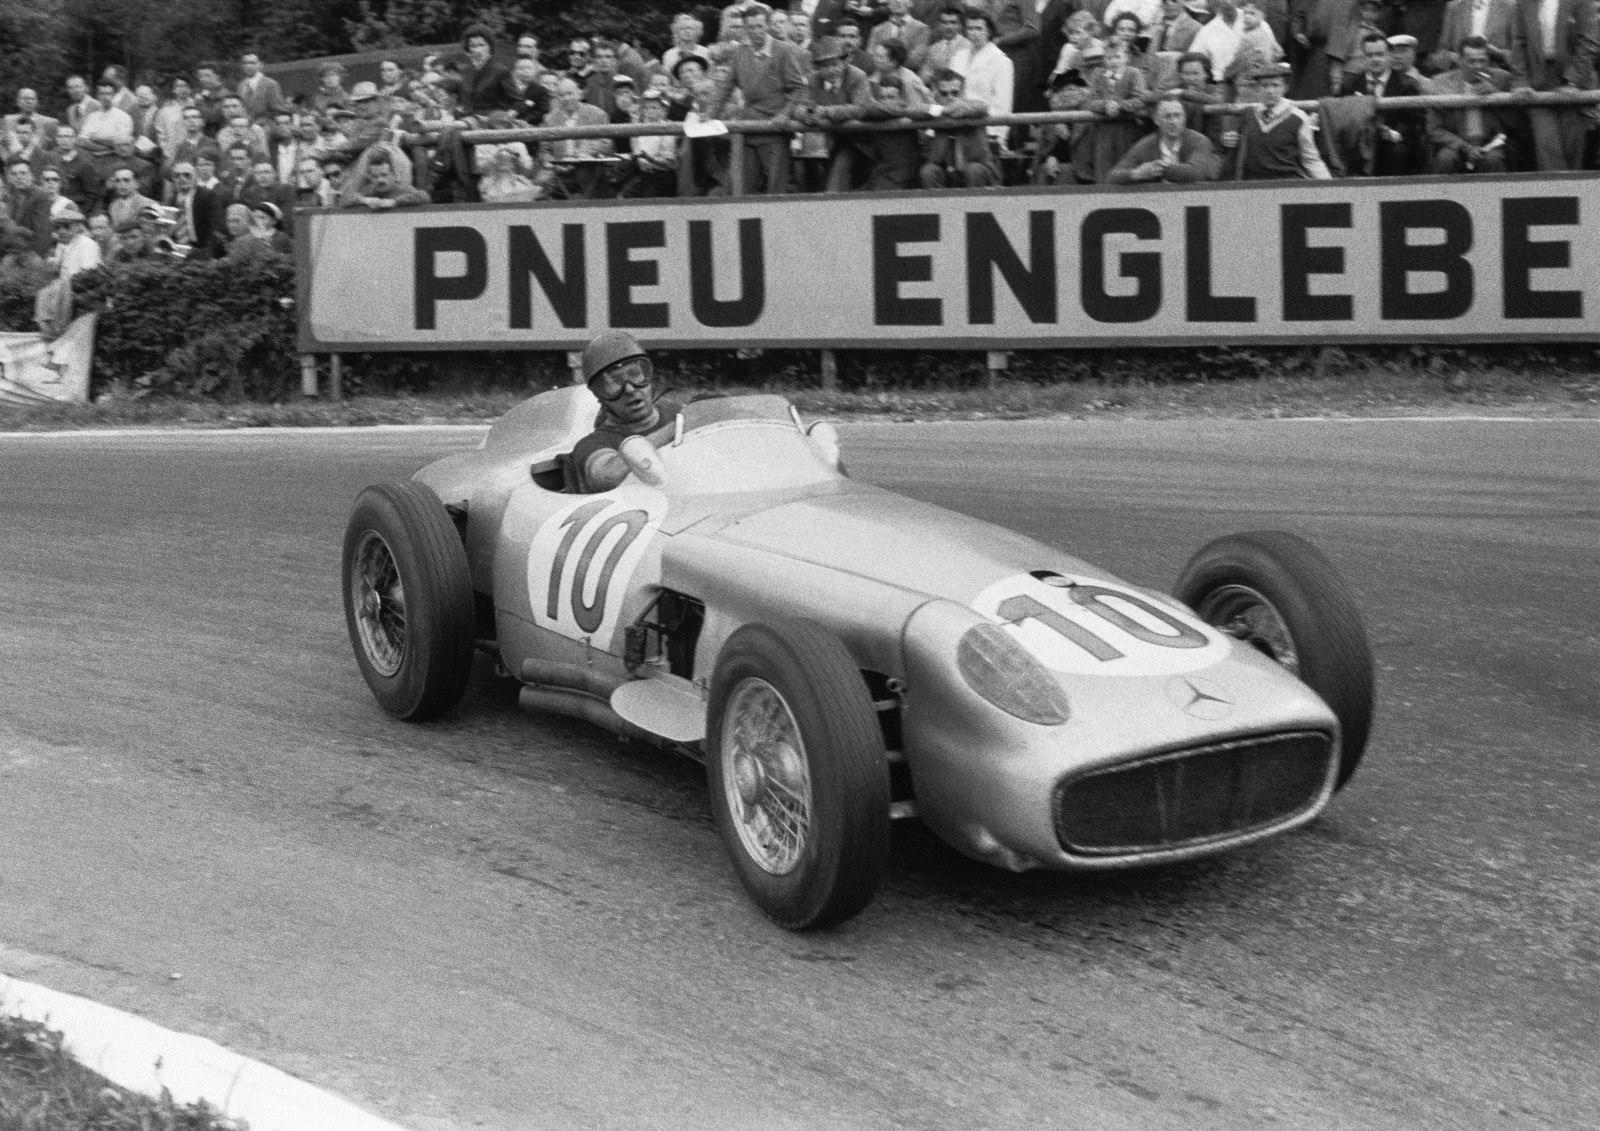 Juan Manuel Fangio Wallpaper Vintage postwar images Pinterest 1600x1131